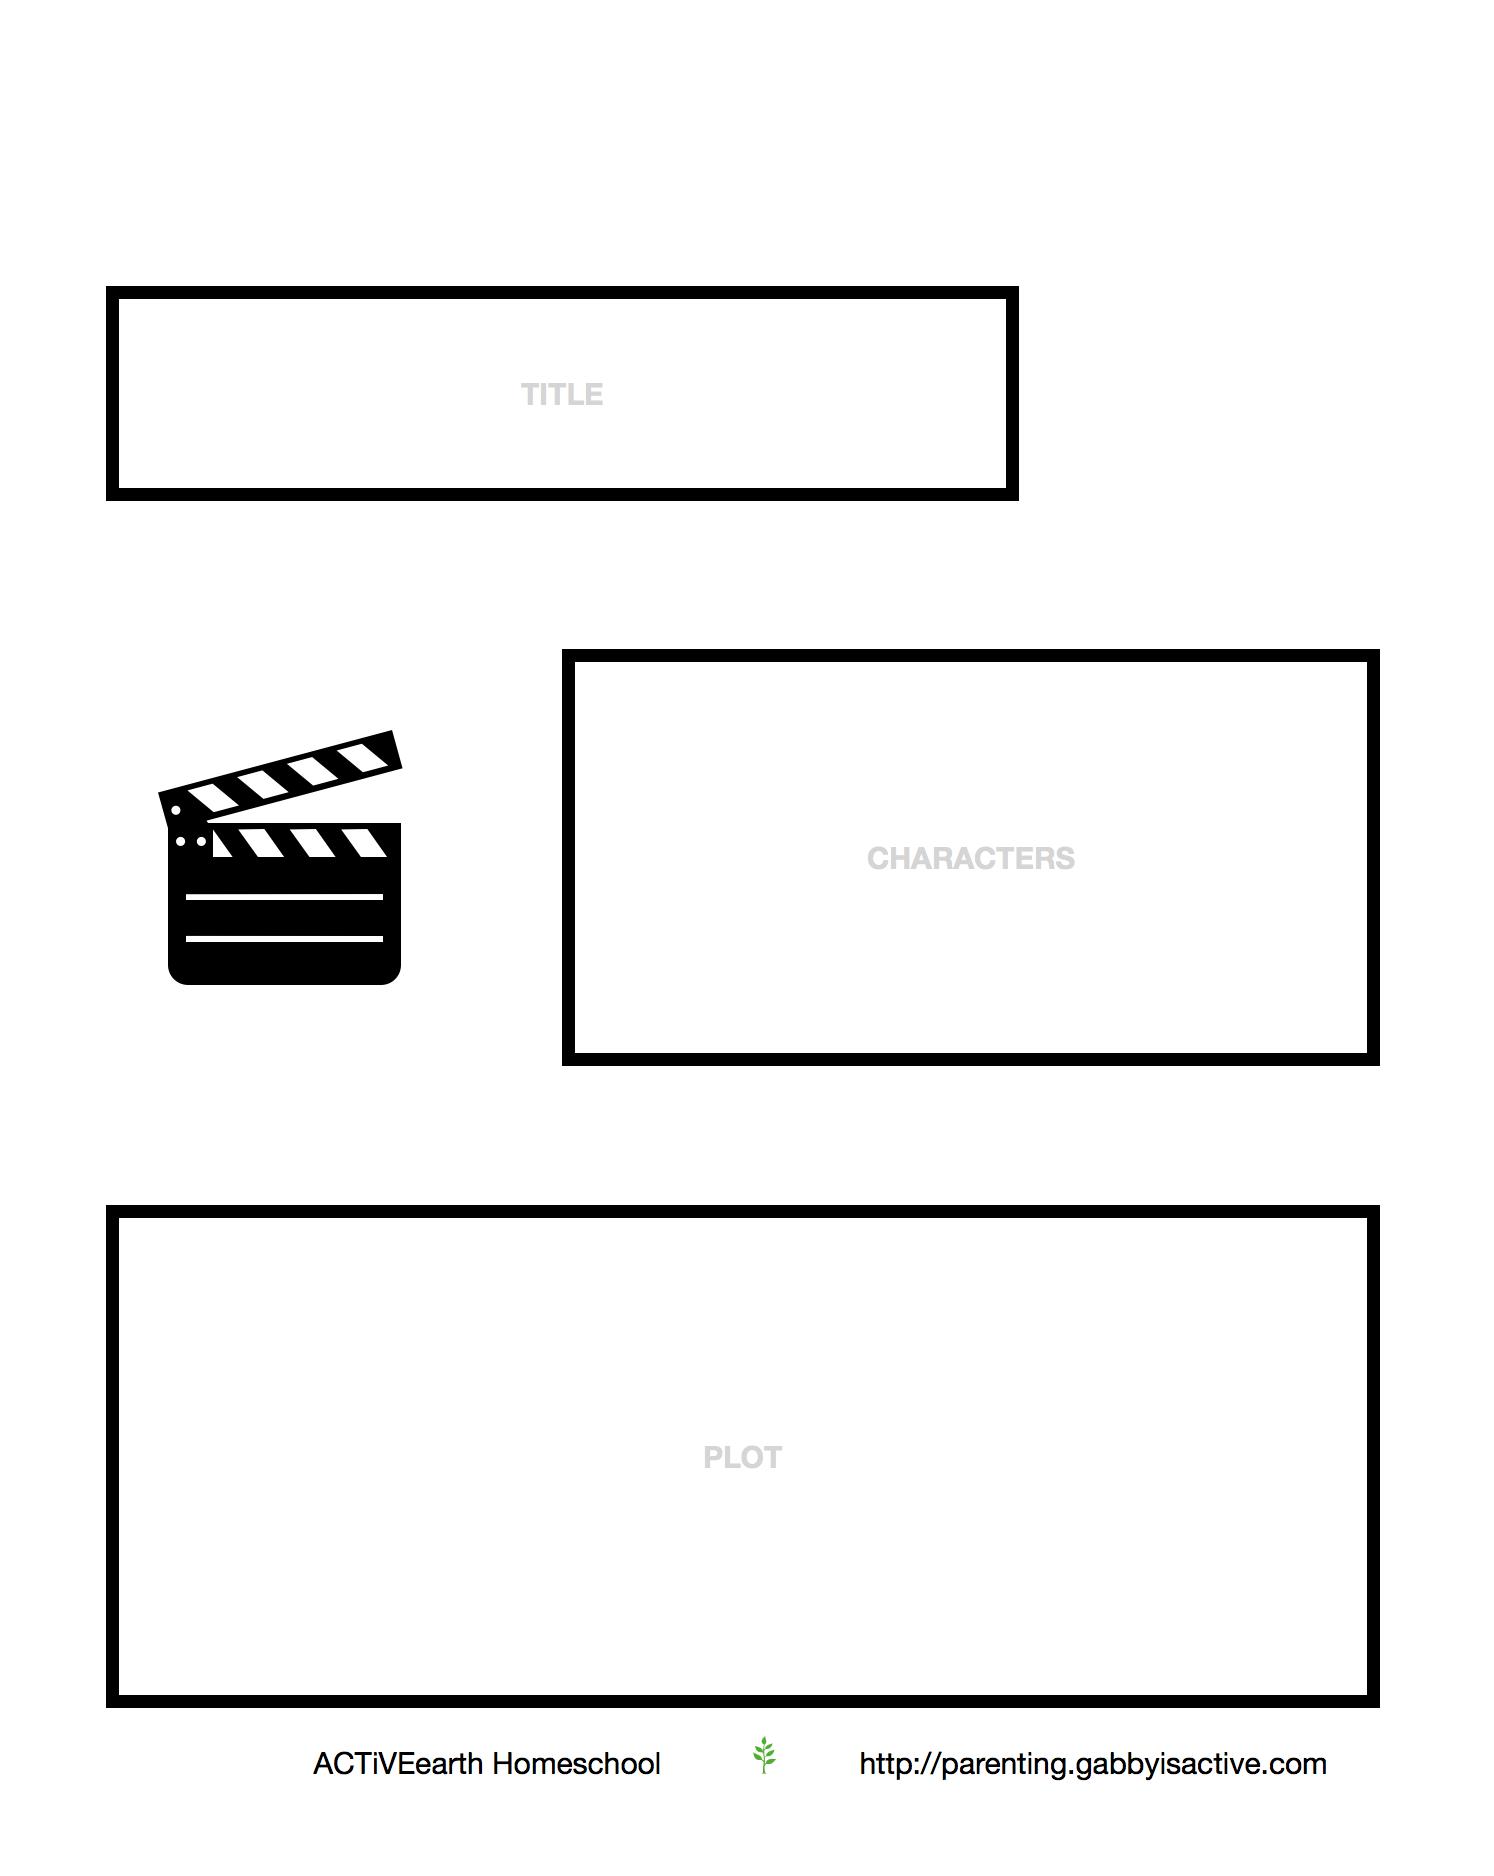 Film Review Worksheet For Kids Activeearth